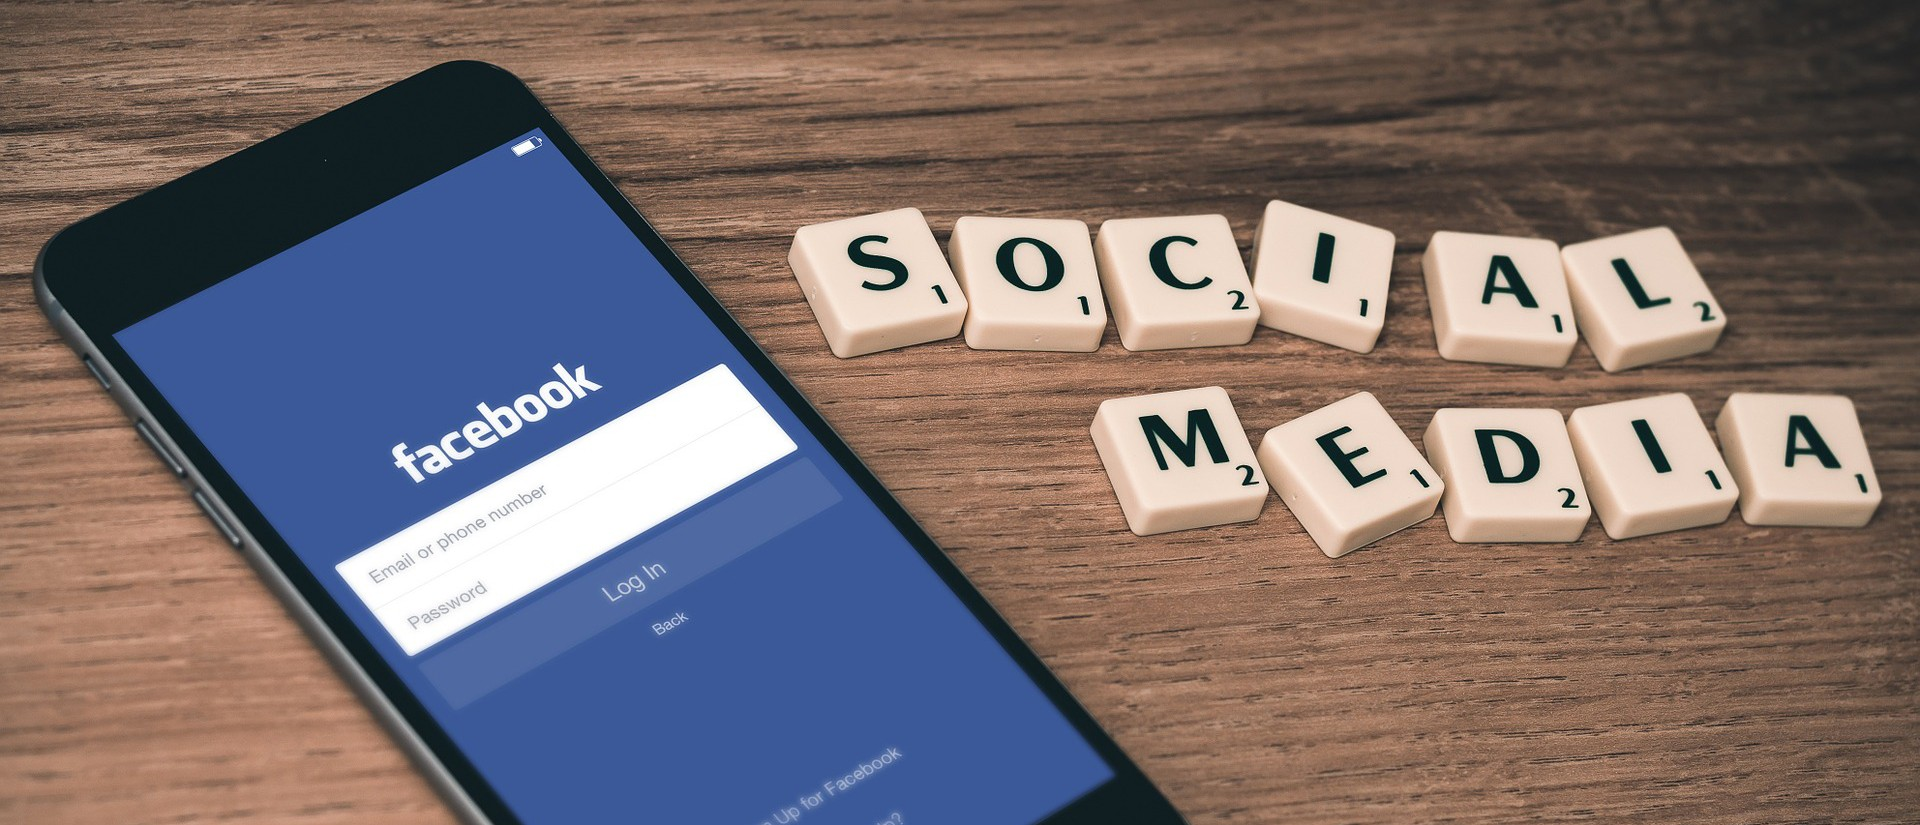 social-media-763731_1920-e1450197550185